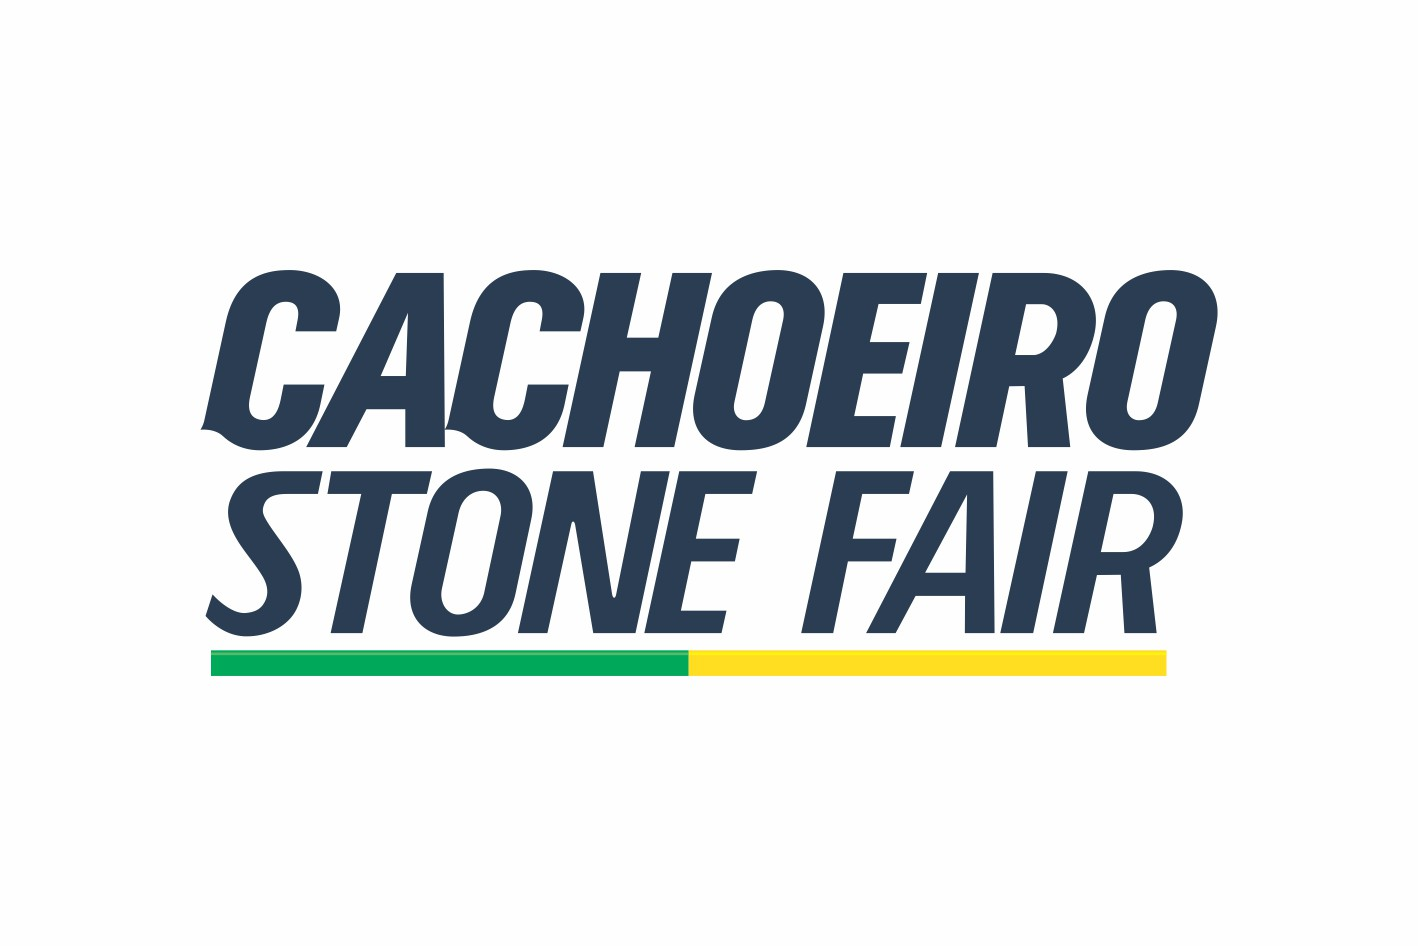 Cachoeiro Stone Fair - logotipo